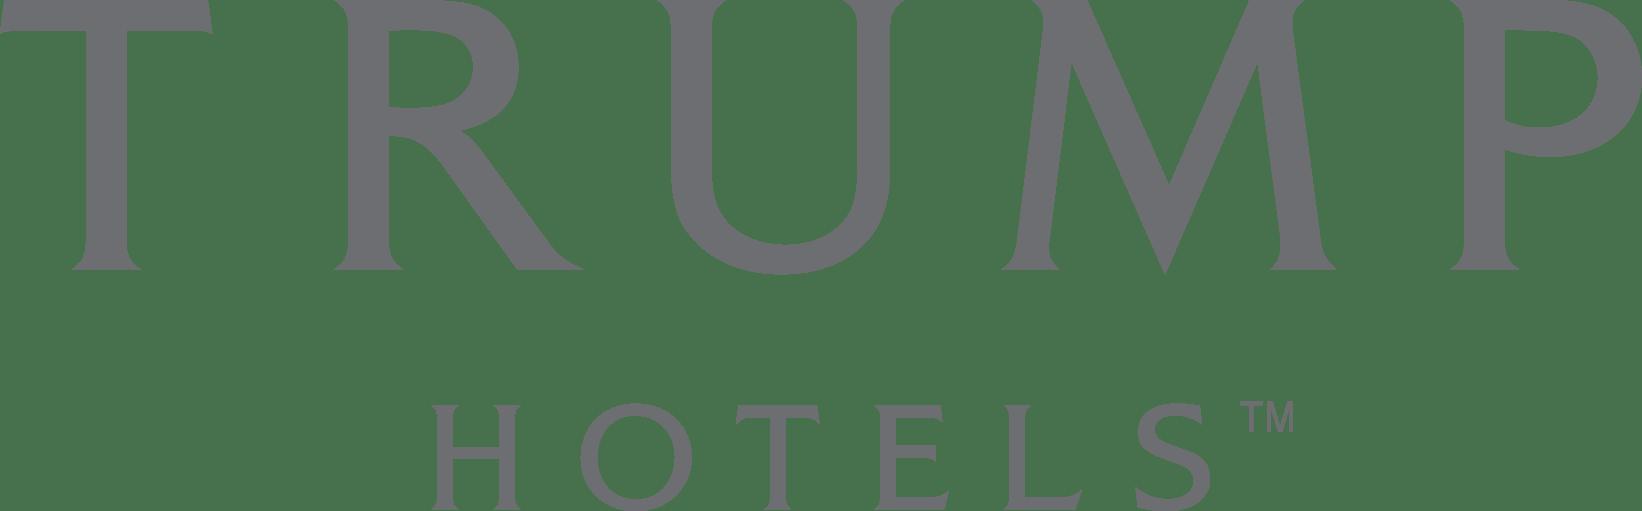 Trump Hotels Logo Transparent Png Stickpng